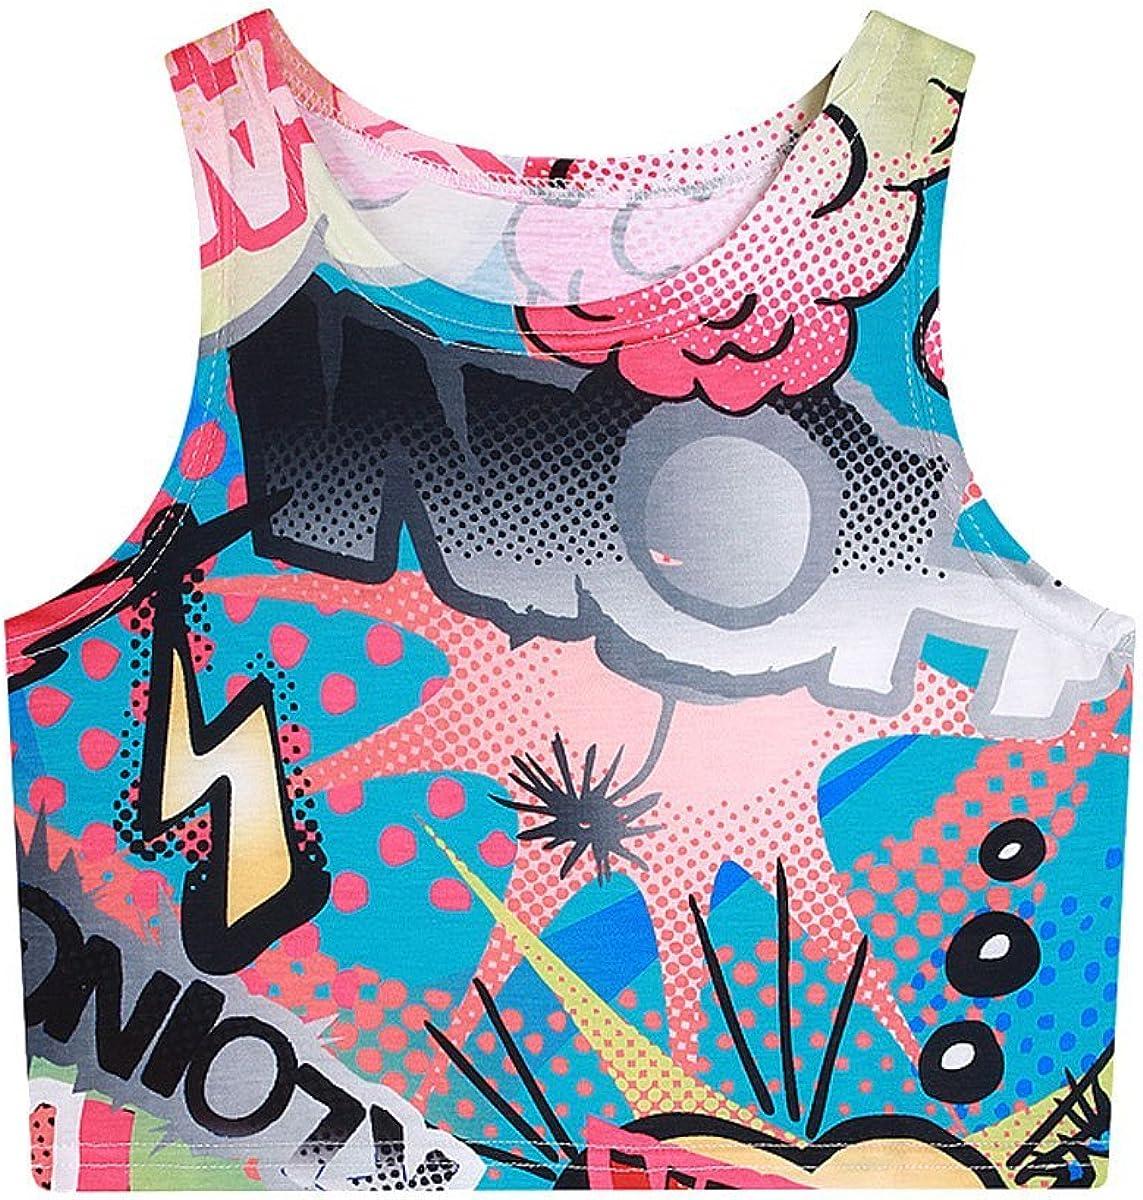 EFZQ Girls Womens Emoji Elastic Printed Backless Camis Crop Top